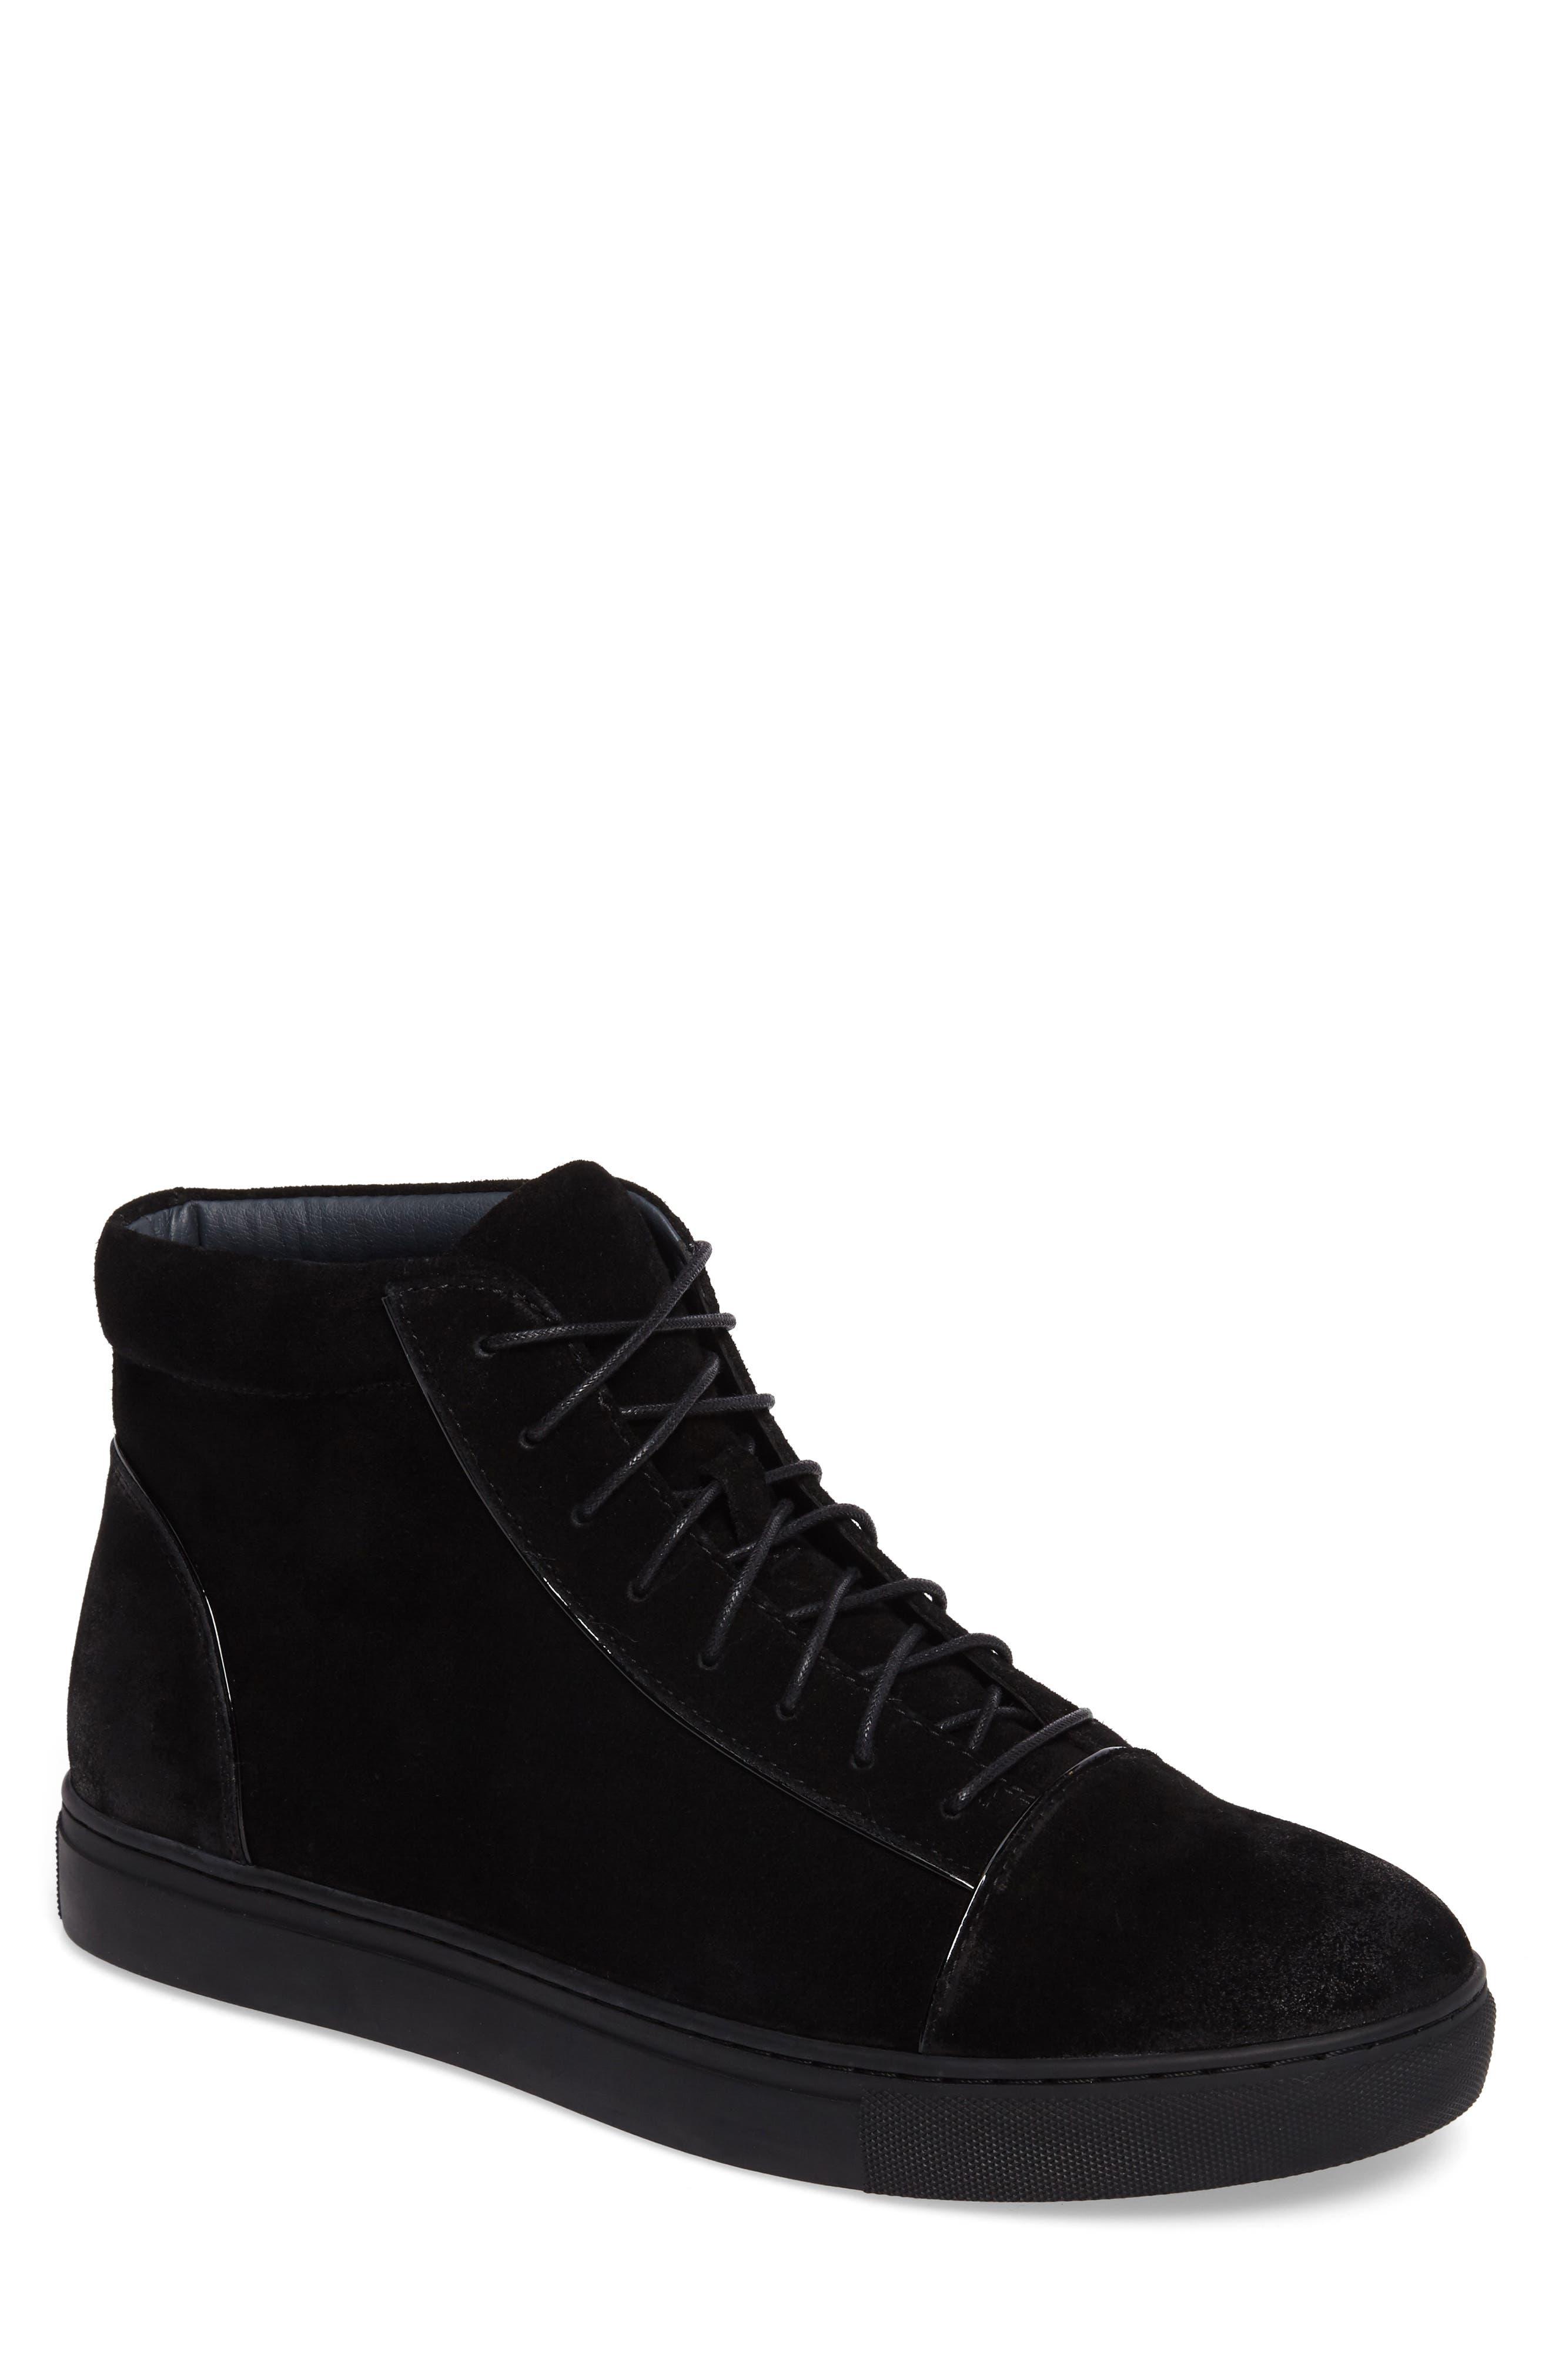 Grundy Sneaker,                         Main,                         color, Black Suede